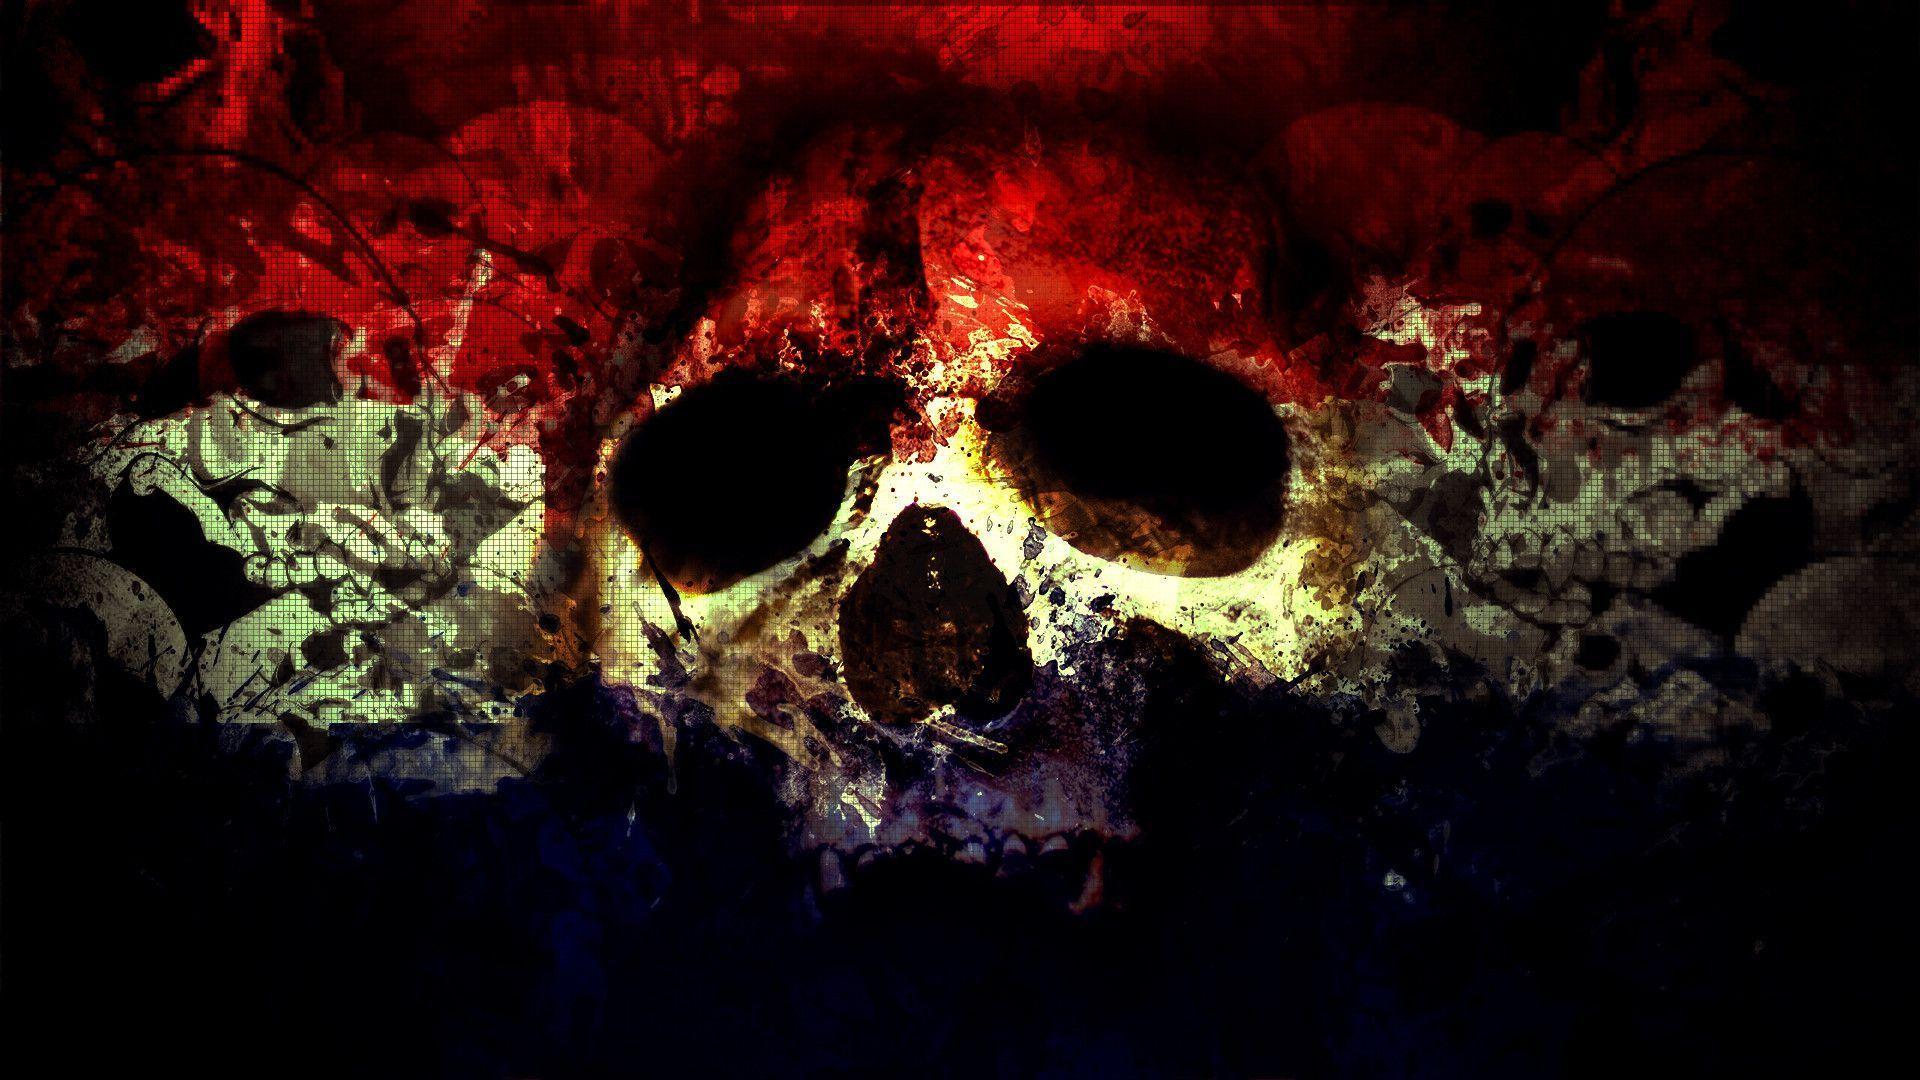 Girly Skull Wallpapers - Top Free Girly Skull Backgrounds